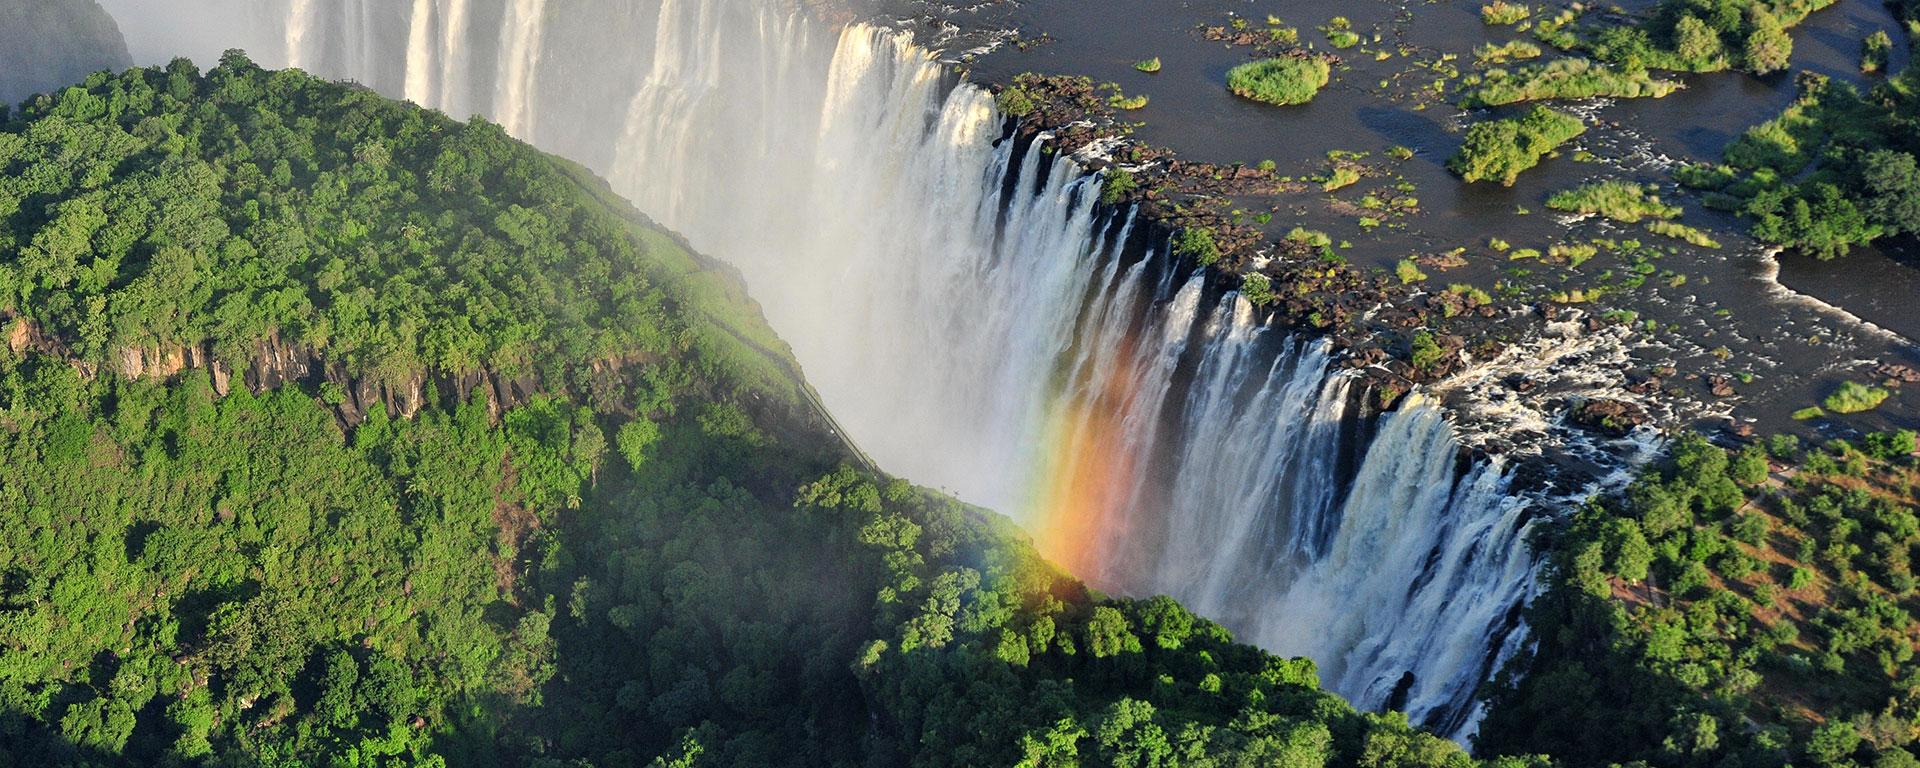 Fall Road Wallpaper Best Victoria Falls Zambia Guide For 2019 Go2africa Com